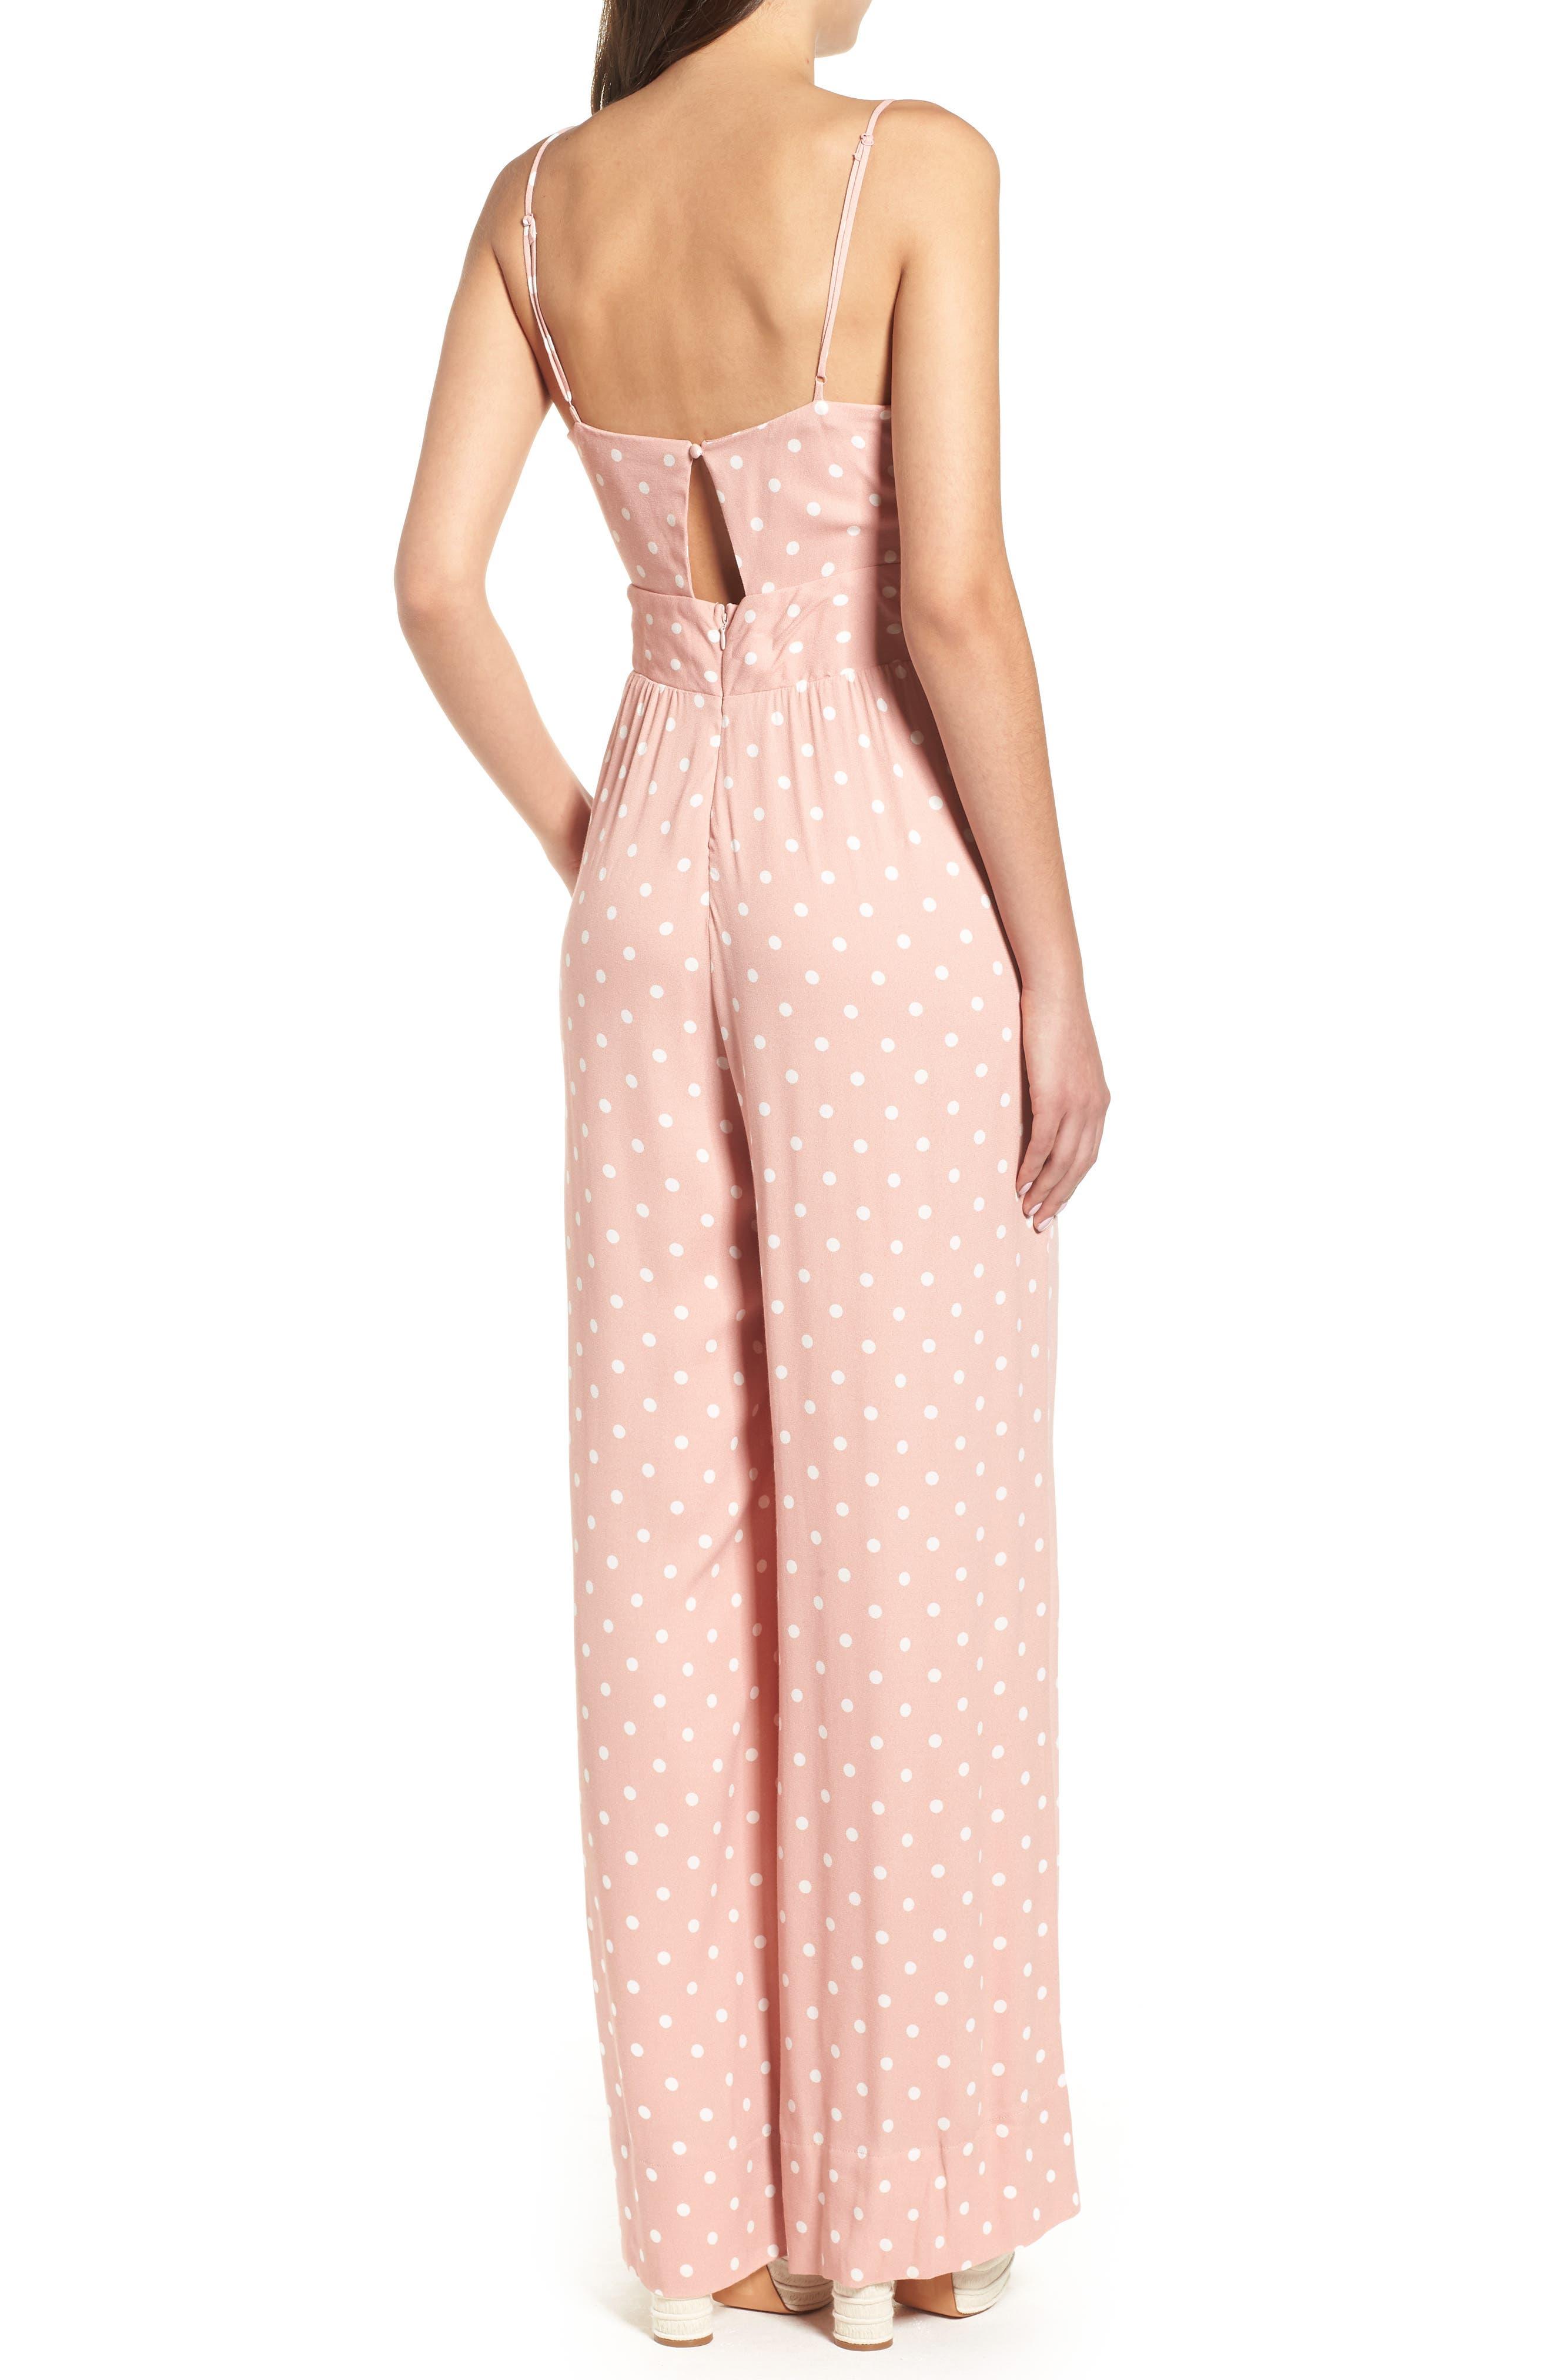 Milan Tie Front Jumpsuit,                             Alternate thumbnail 2, color,                             Misty Rose Polka Dot